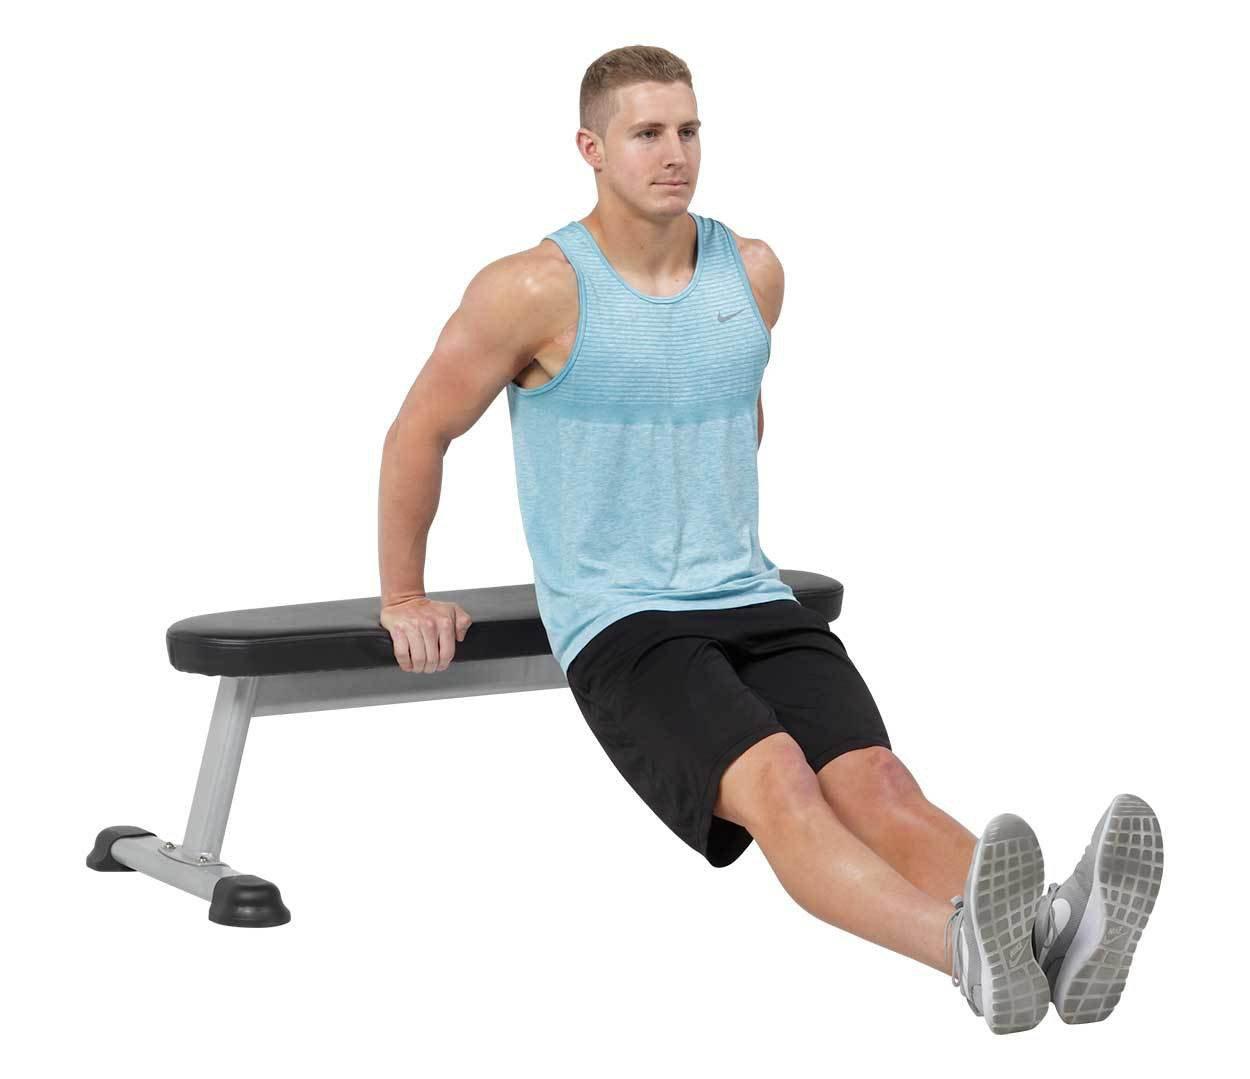 Best Workout Technique #7 - Bench Dip Exercise